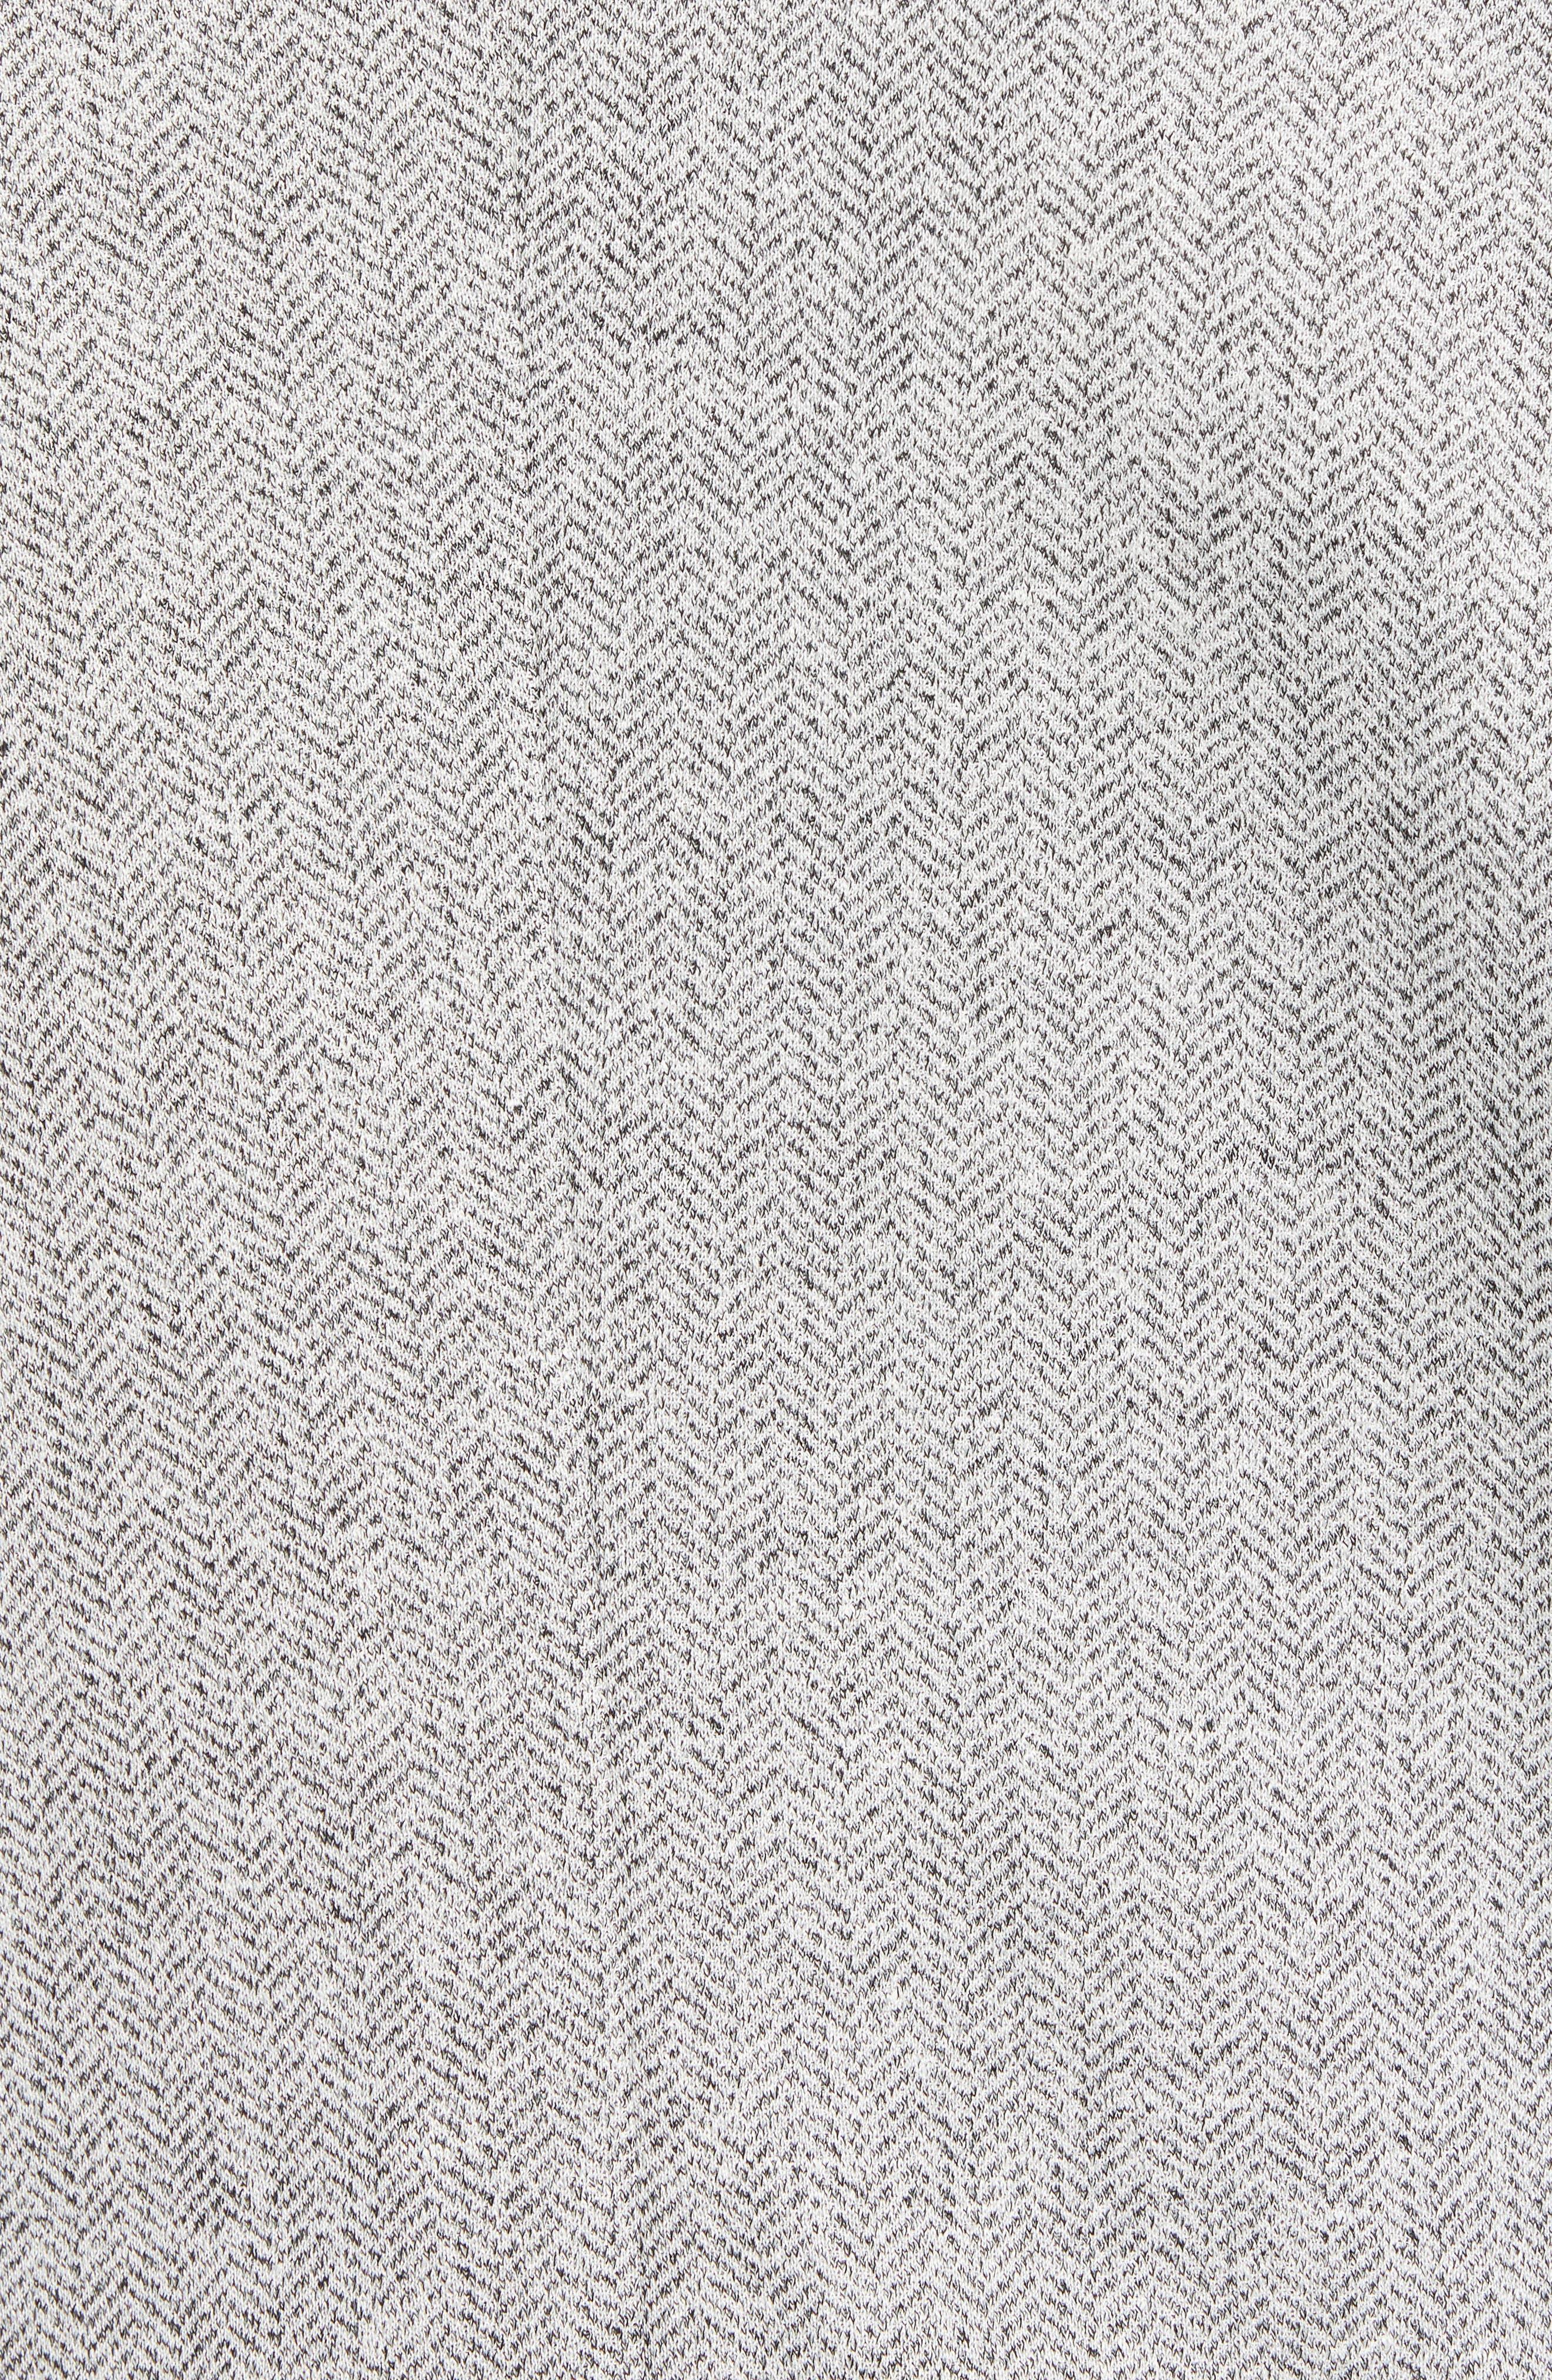 Regular Fit Herringbone Cotton & Linen Blazer,                             Alternate thumbnail 6, color,                             040